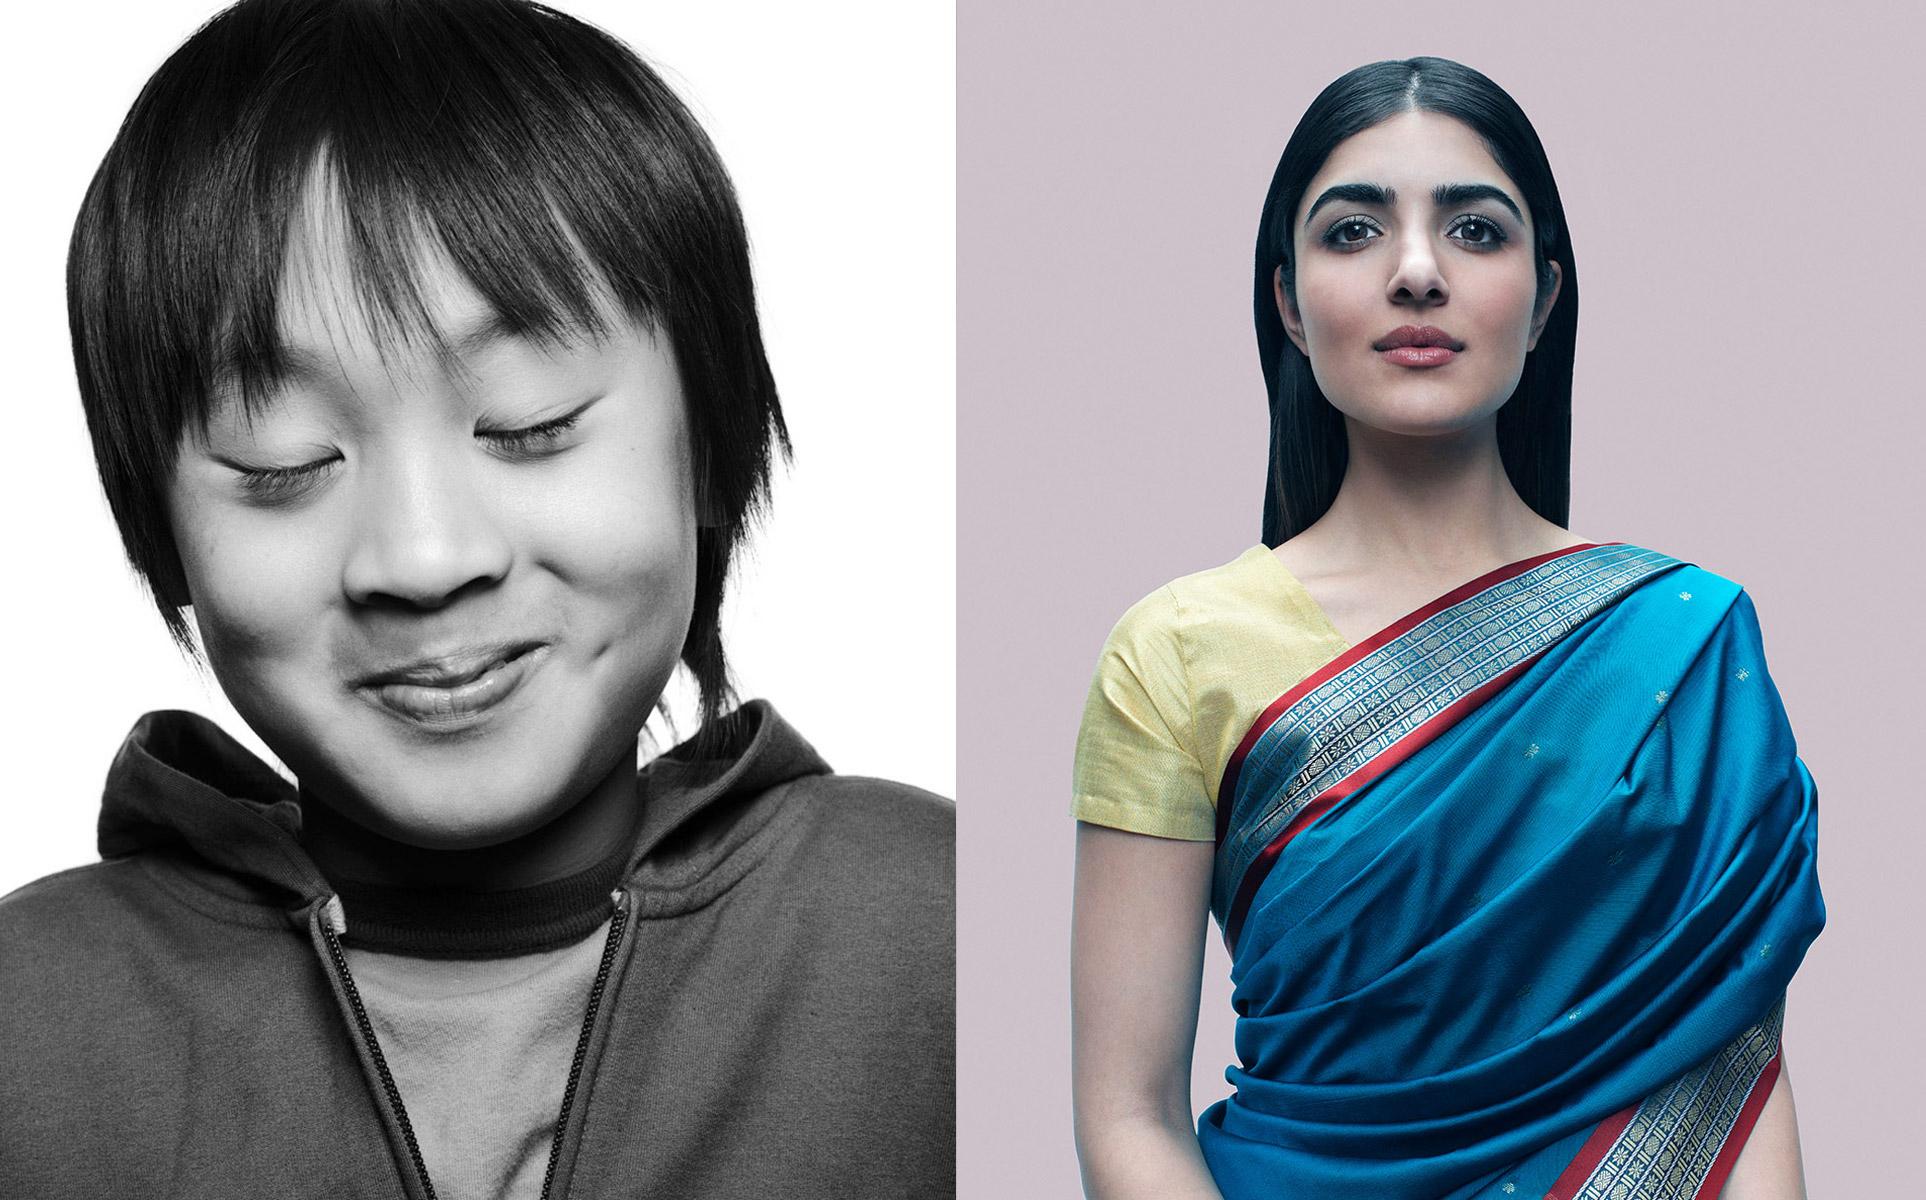 PR_boy-indian_sq.jpg